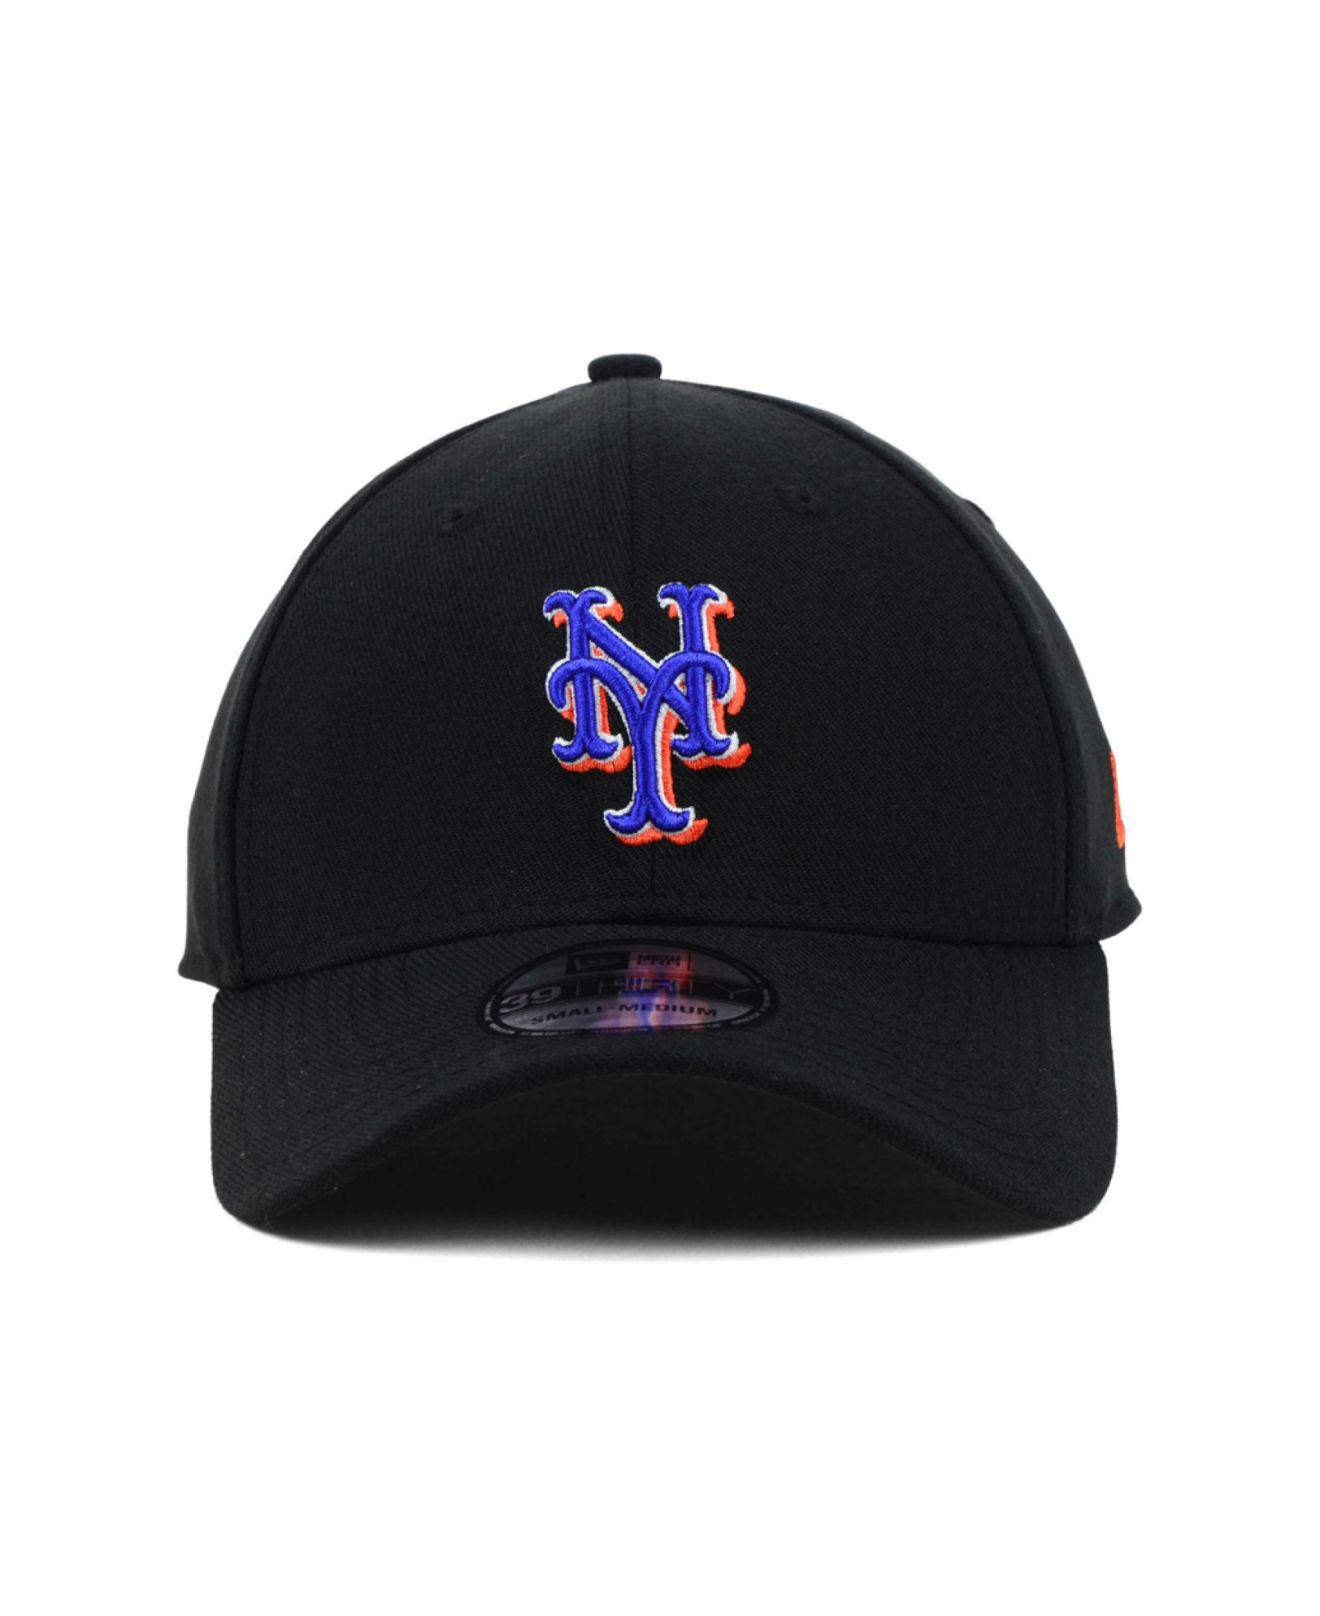 the best attitude 54363 1d0b4 ... closeout lyst ktz new york mets mlb team classic 39thirty cap in black  for men c4fb0